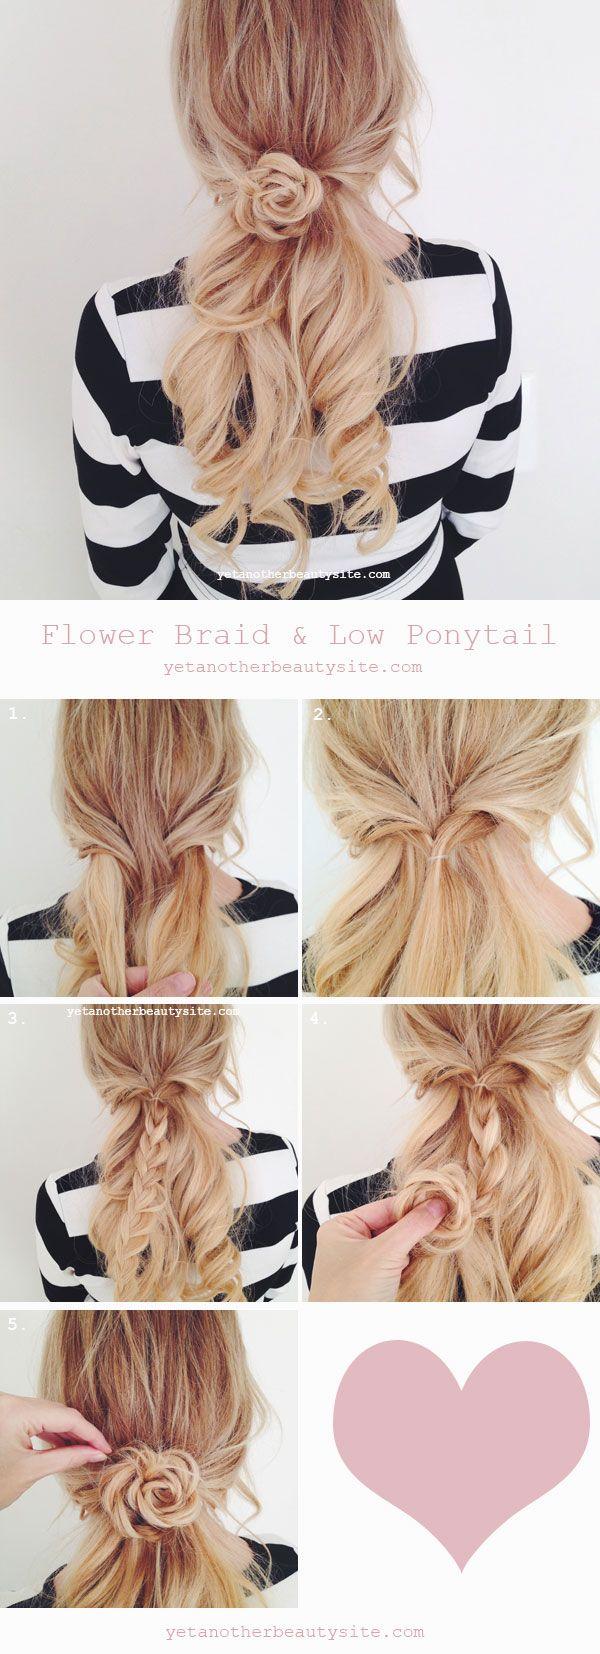 Flower Braid Low Ponytail Hairstyle Tutorial